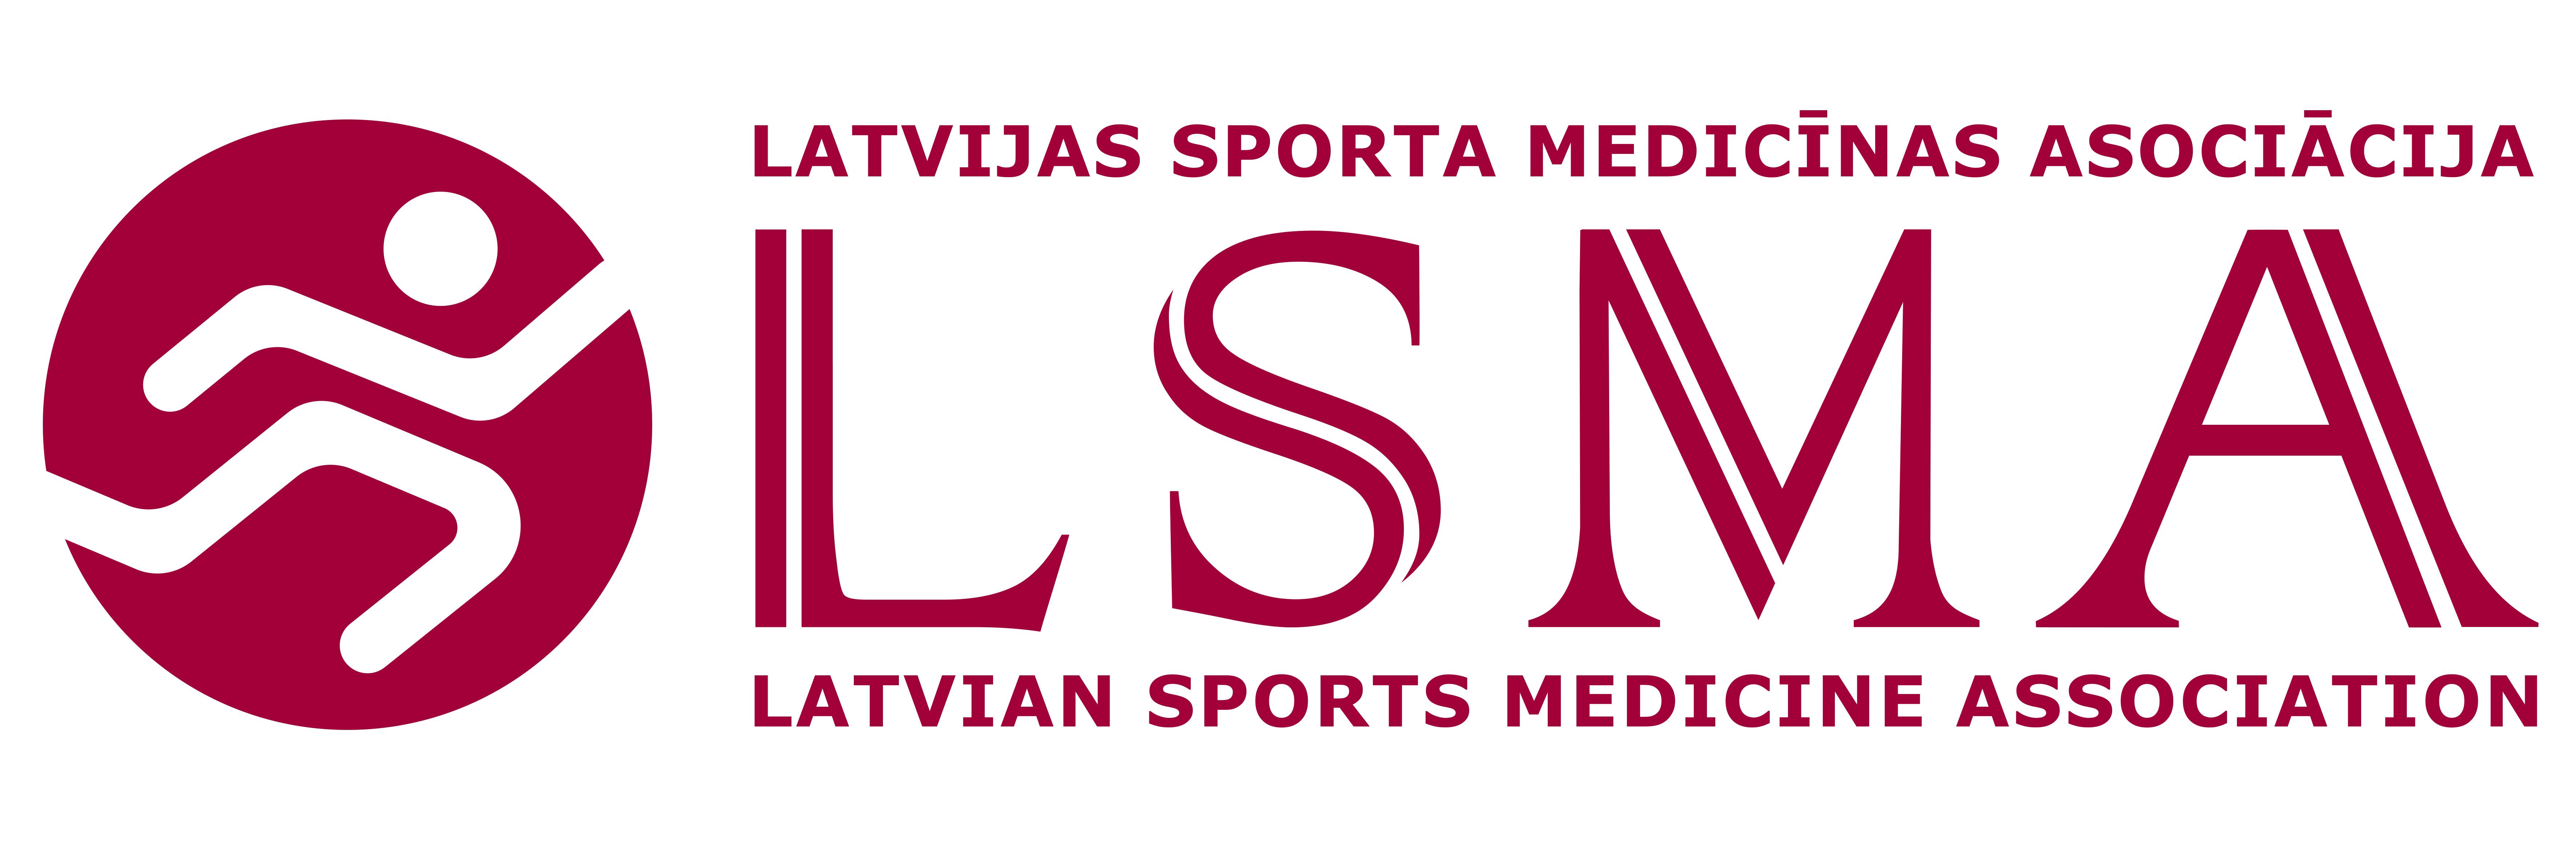 Latvijas Sporta Medicīnas Asociācija